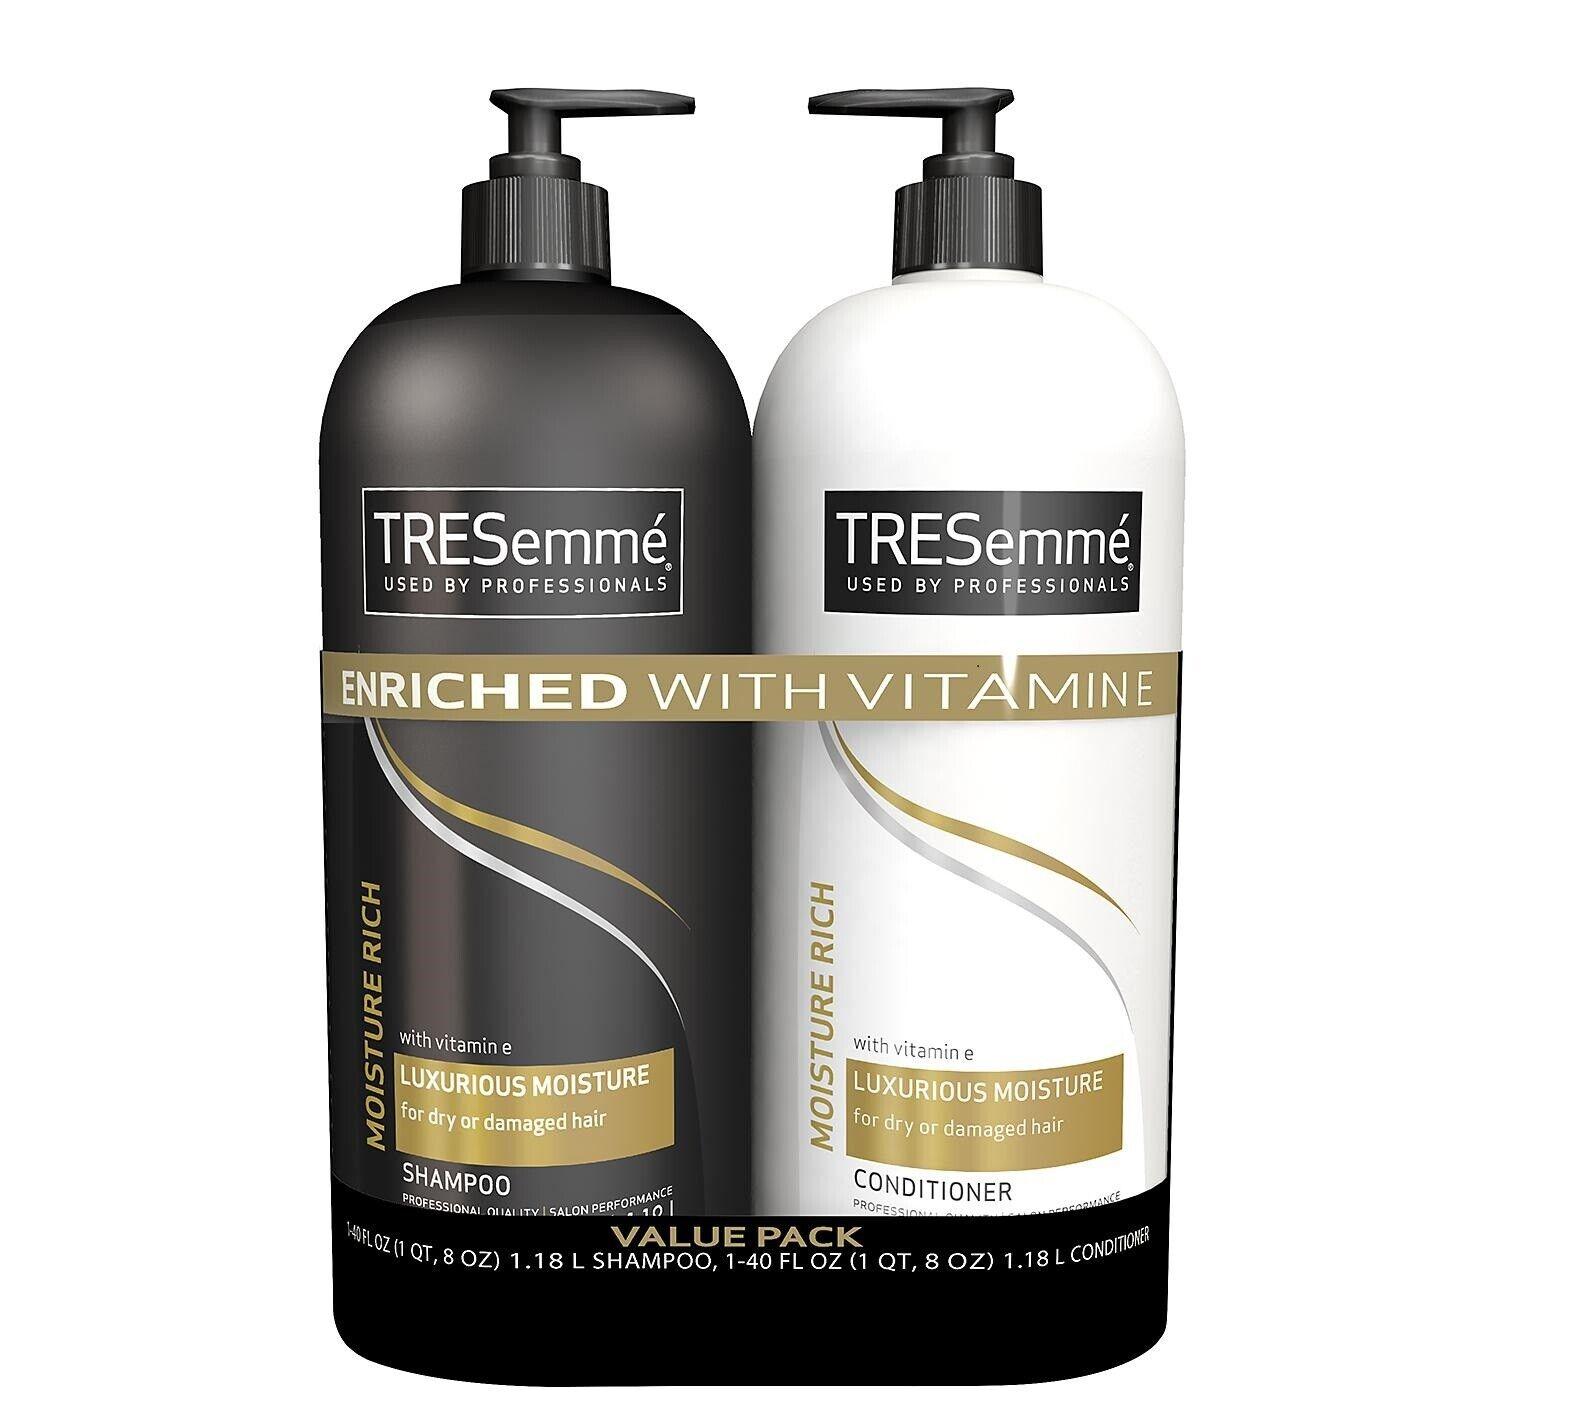 TRESemme Moisture Rich Shampoo & Conditioner Value Pack